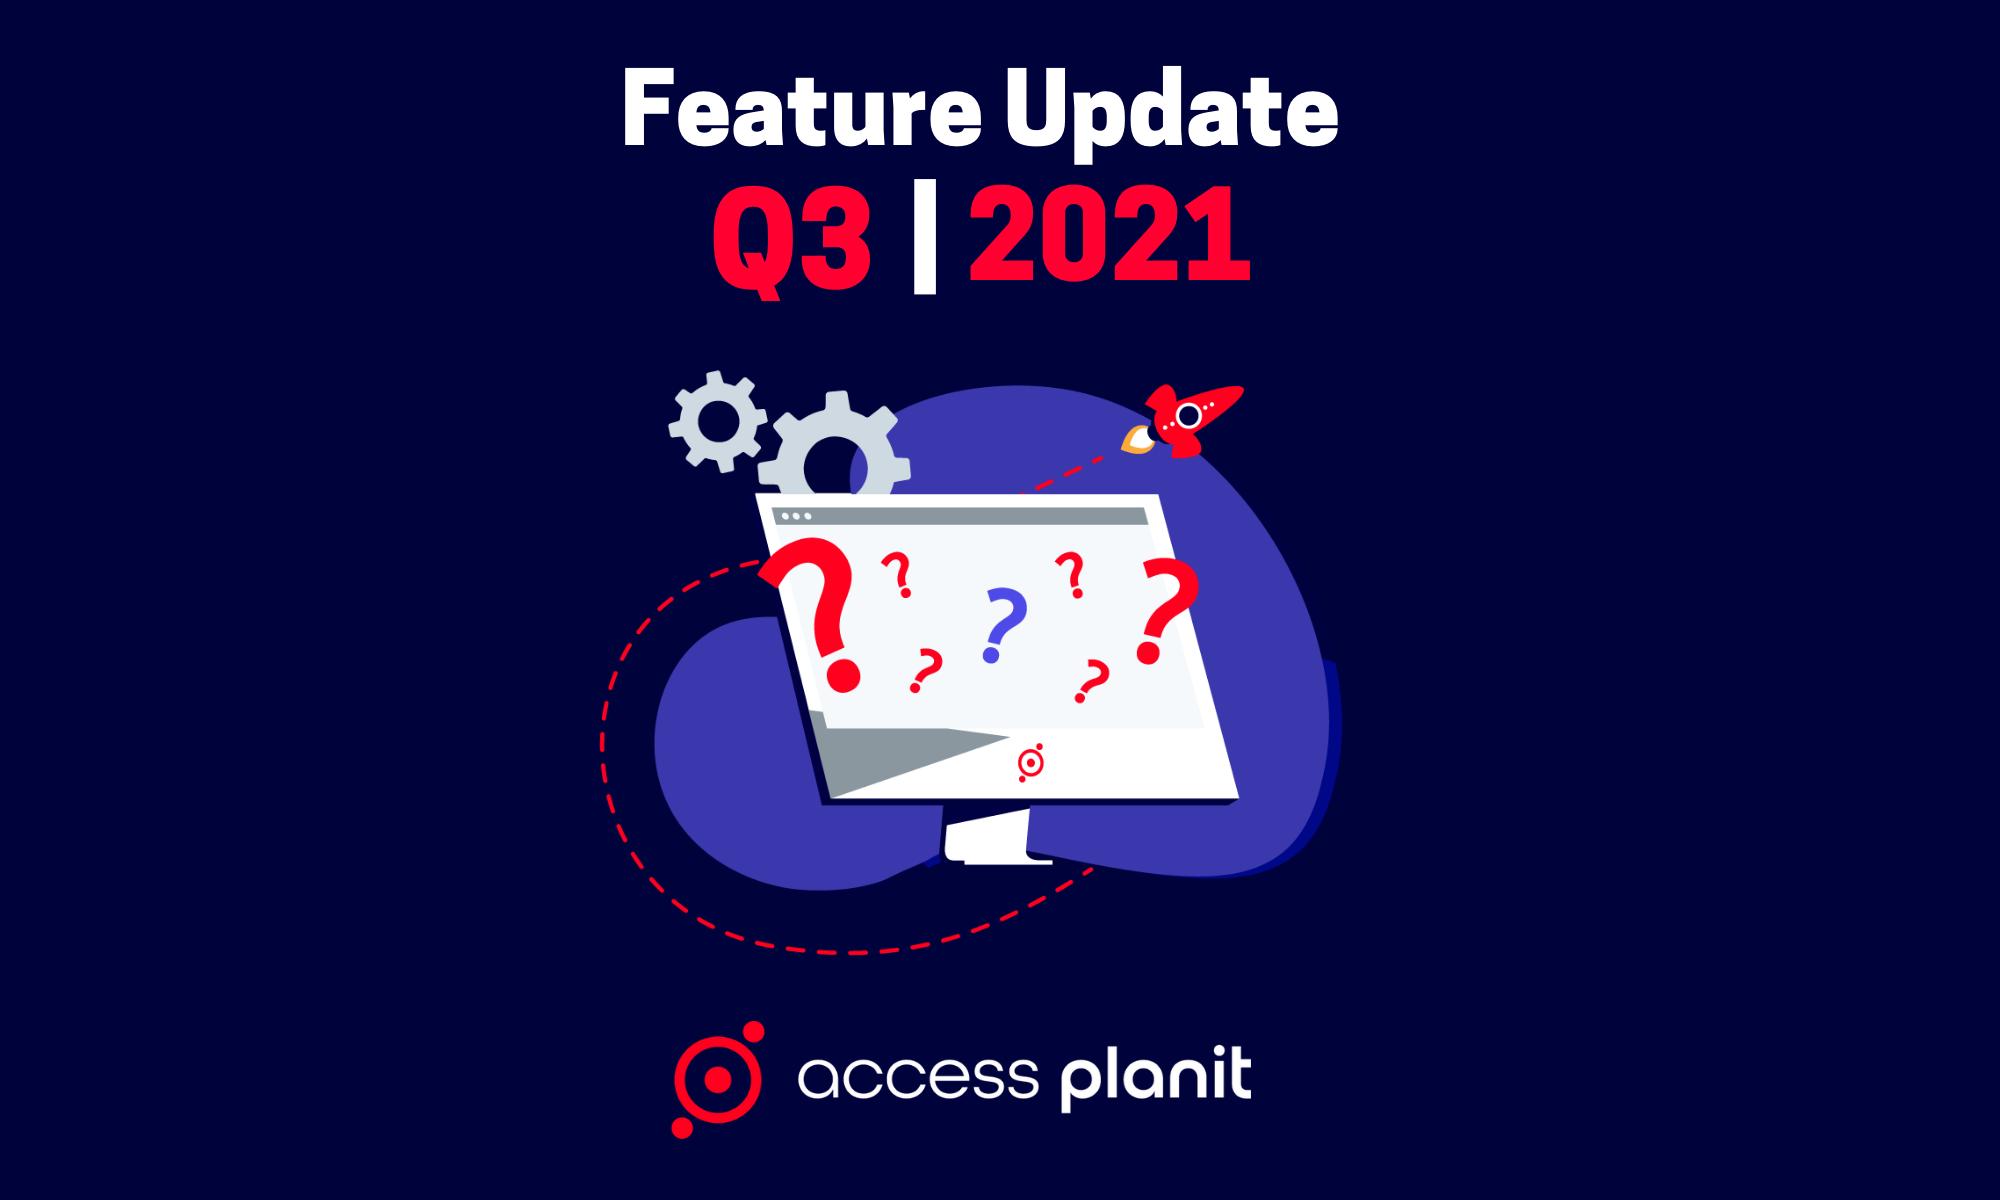 Q3 2021 feature update accessplanit training management software